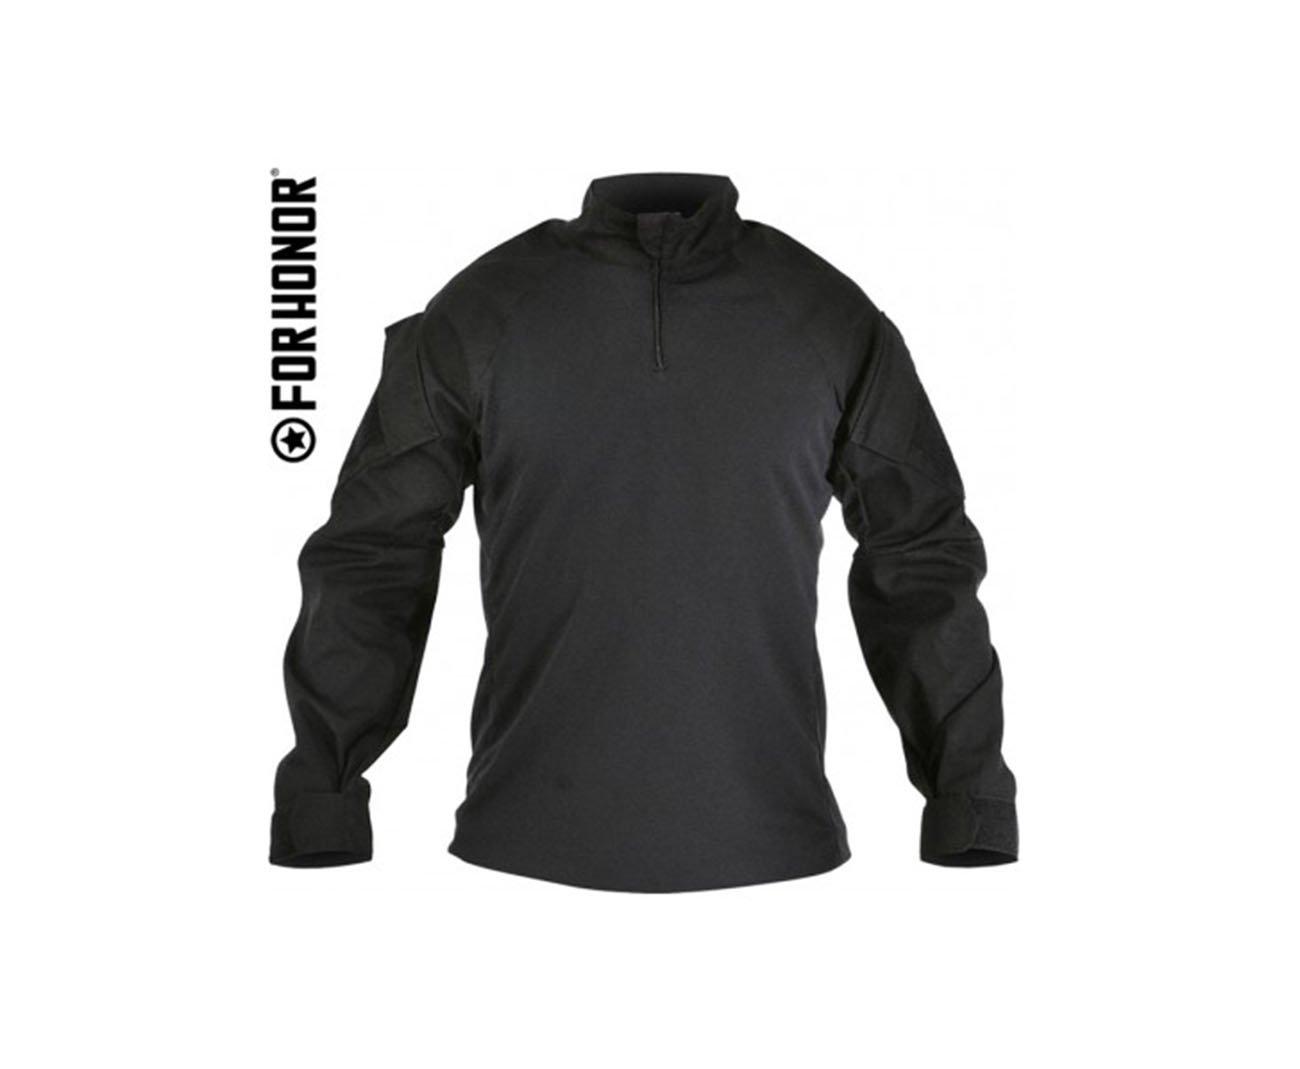 Camisa De Combate 711 Black (combat Shirt)- Forhonor